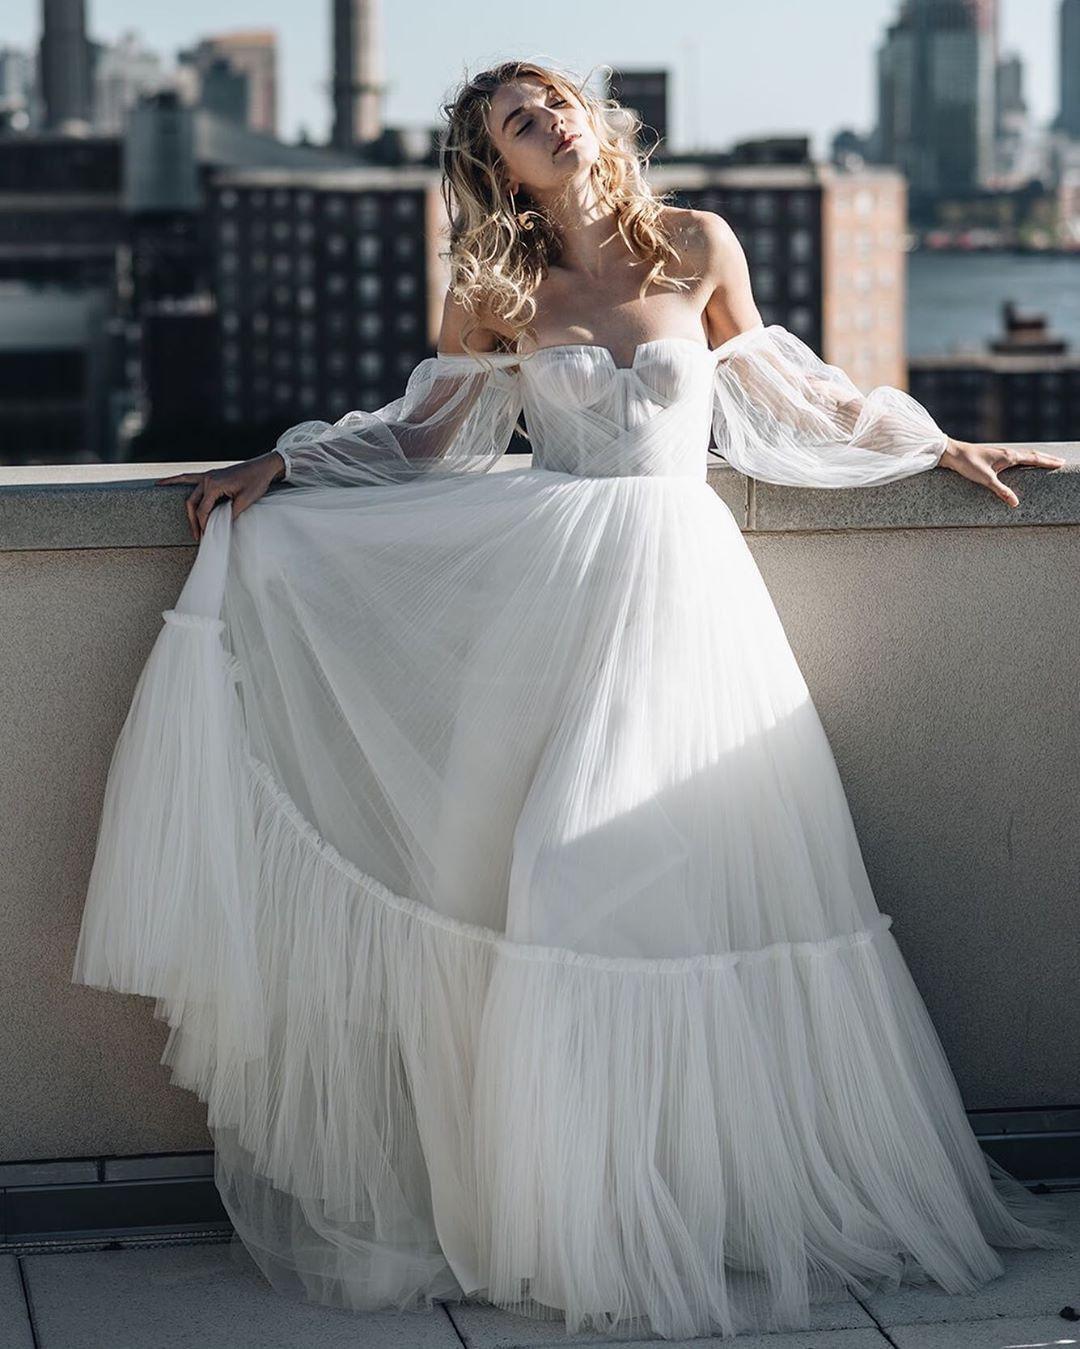 Labude Brautmode Köln - our stunning ARMERIA dress by Alenaleena